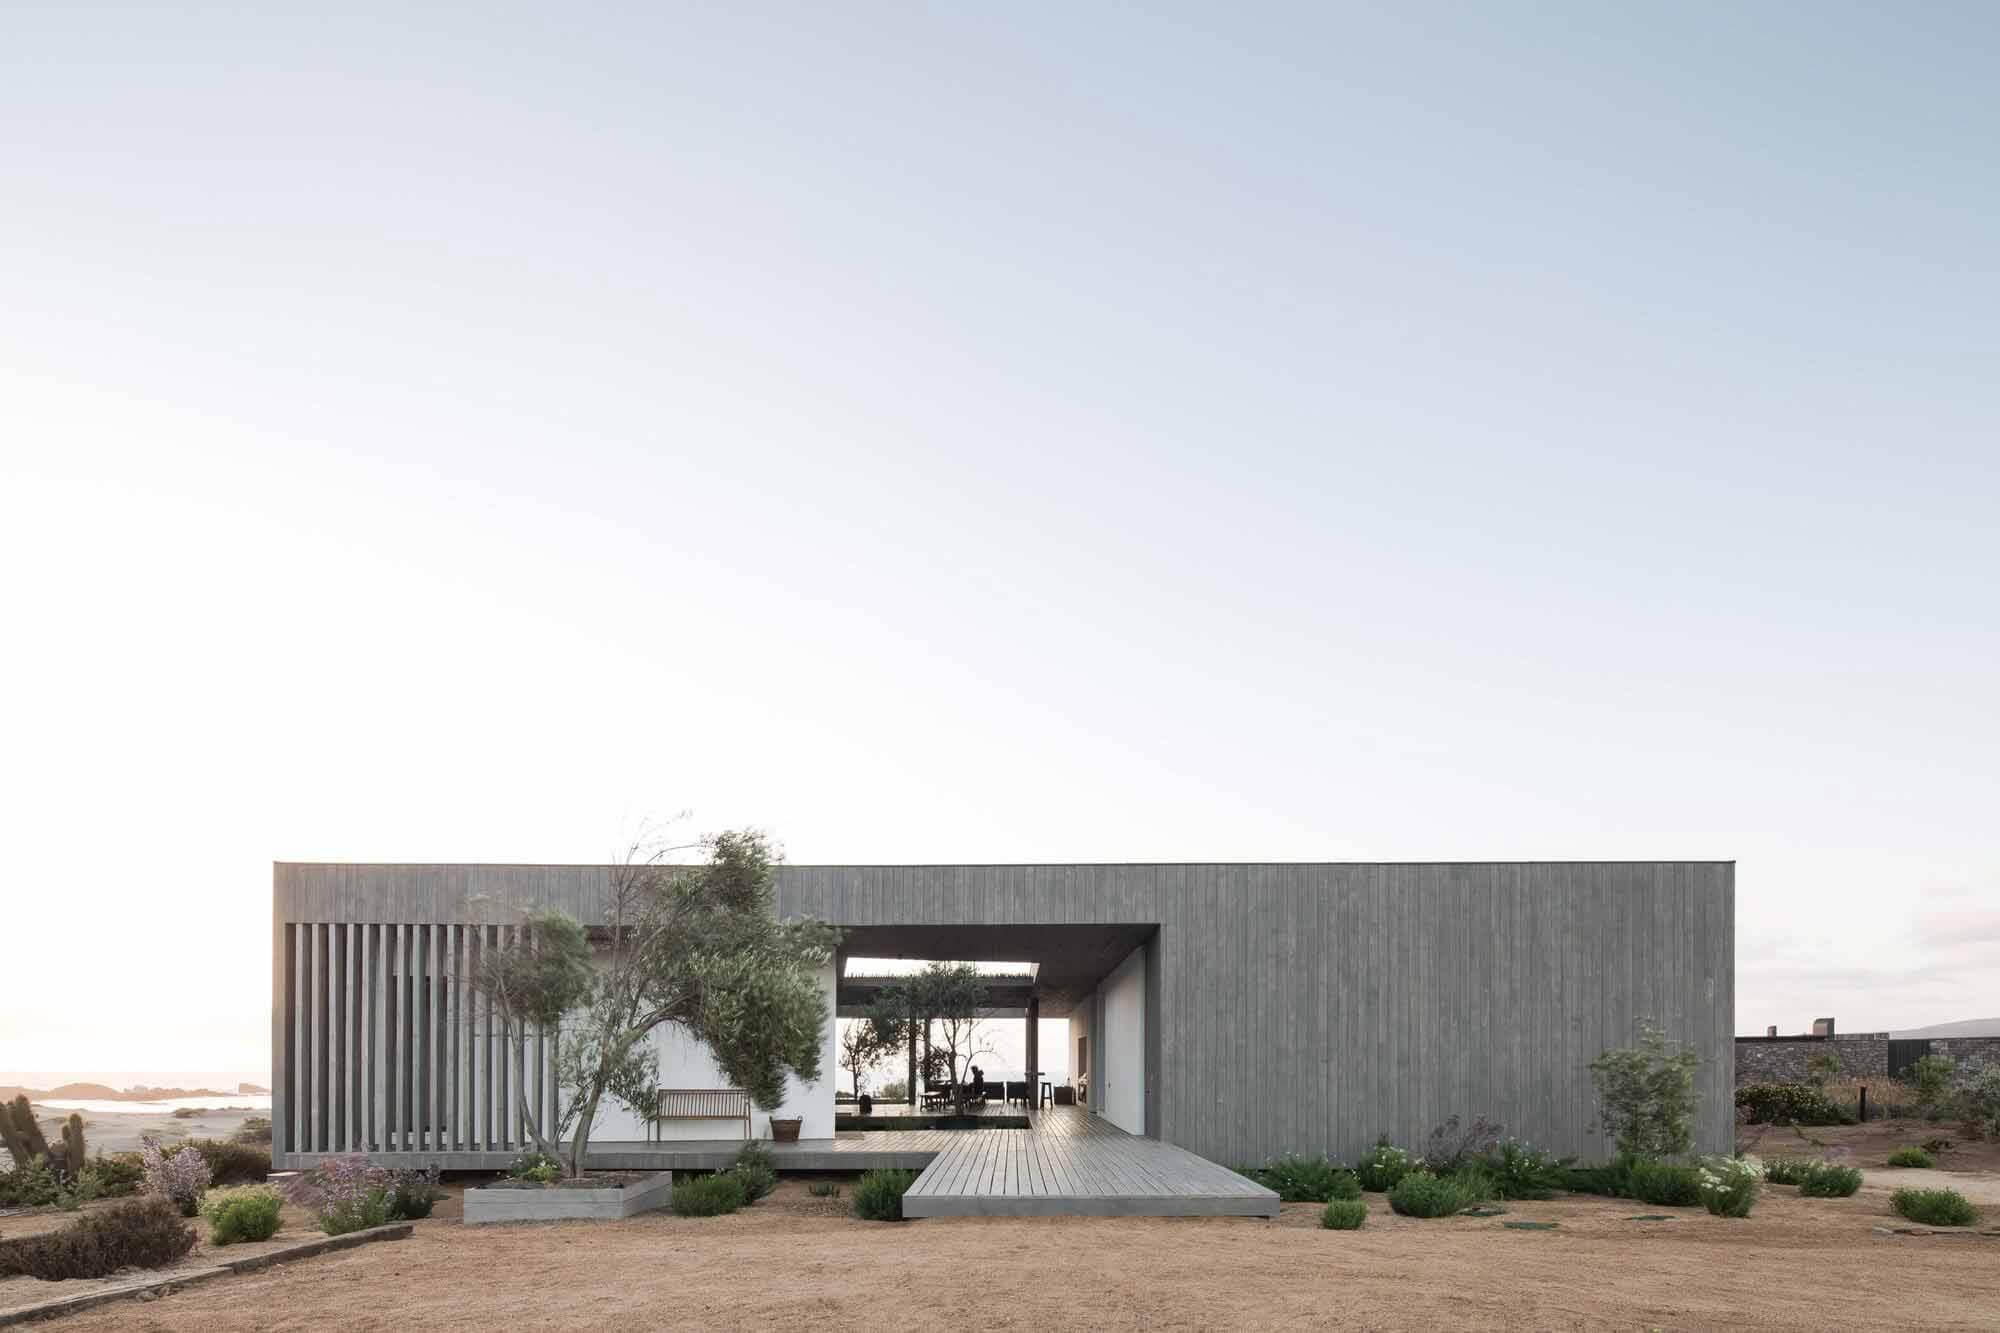 Дом 23 г. н.э. / Apio Arquitectos